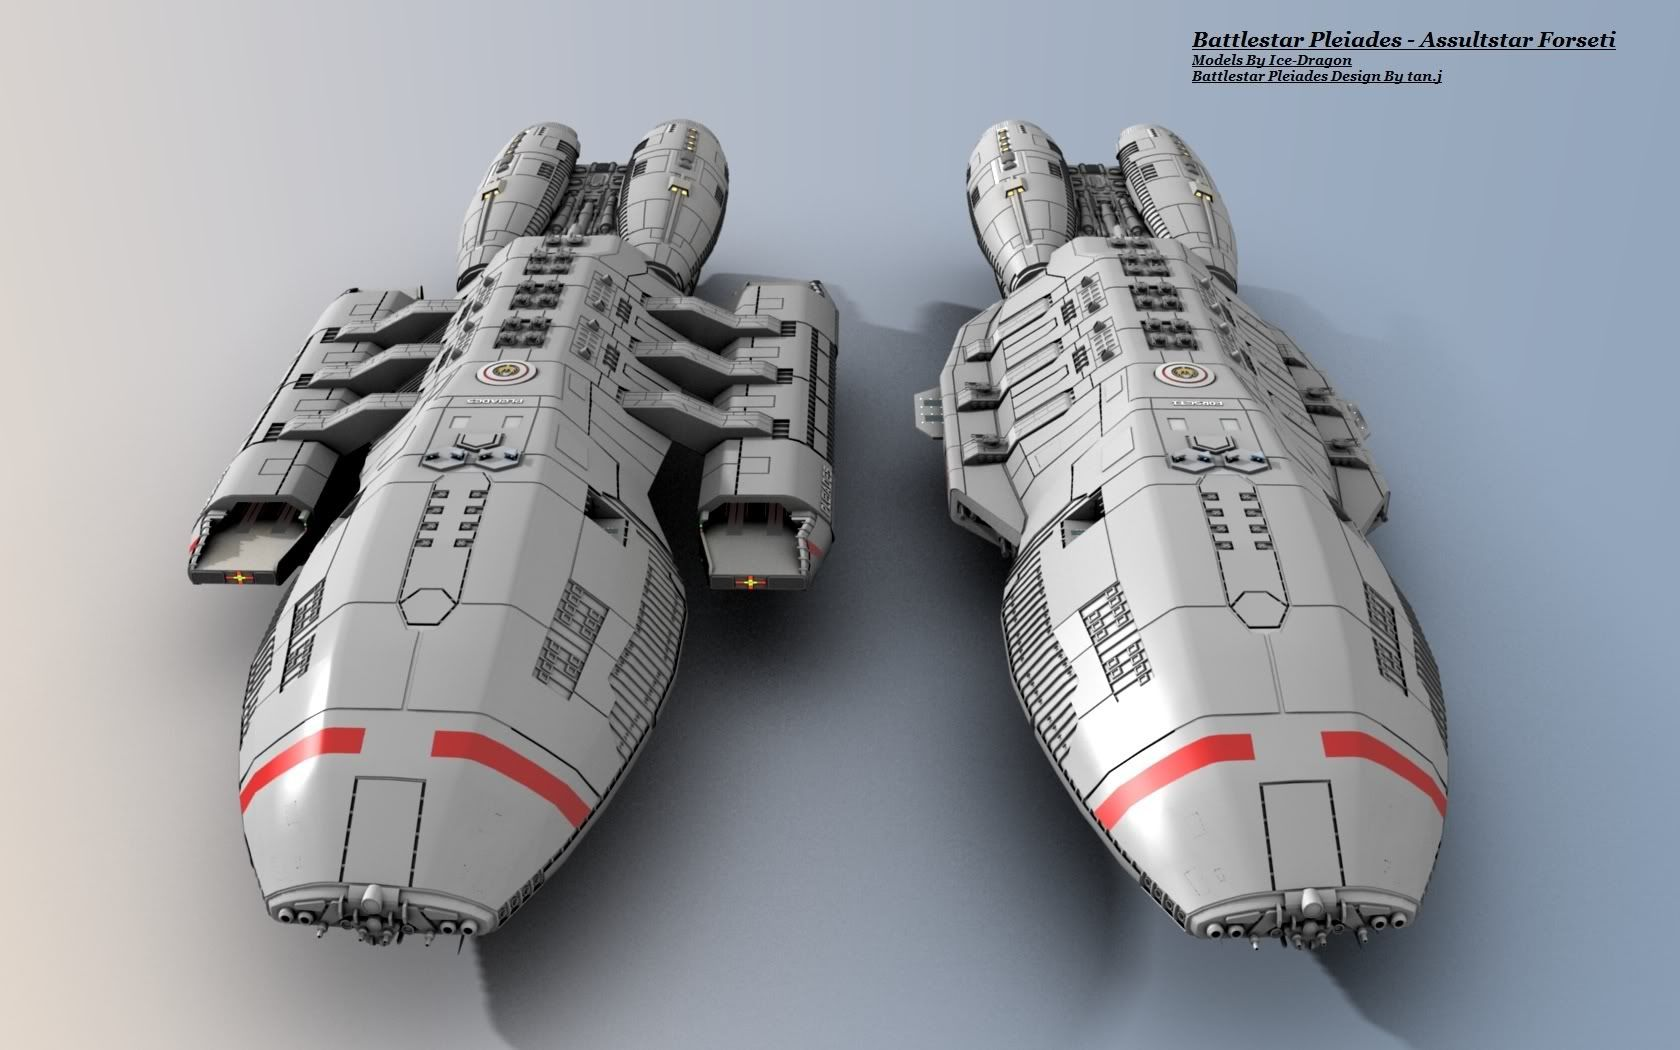 Battlestar Galactica | 4K Stock Video 328-044-691 ...  |Battlestar Galactica Spacecraft